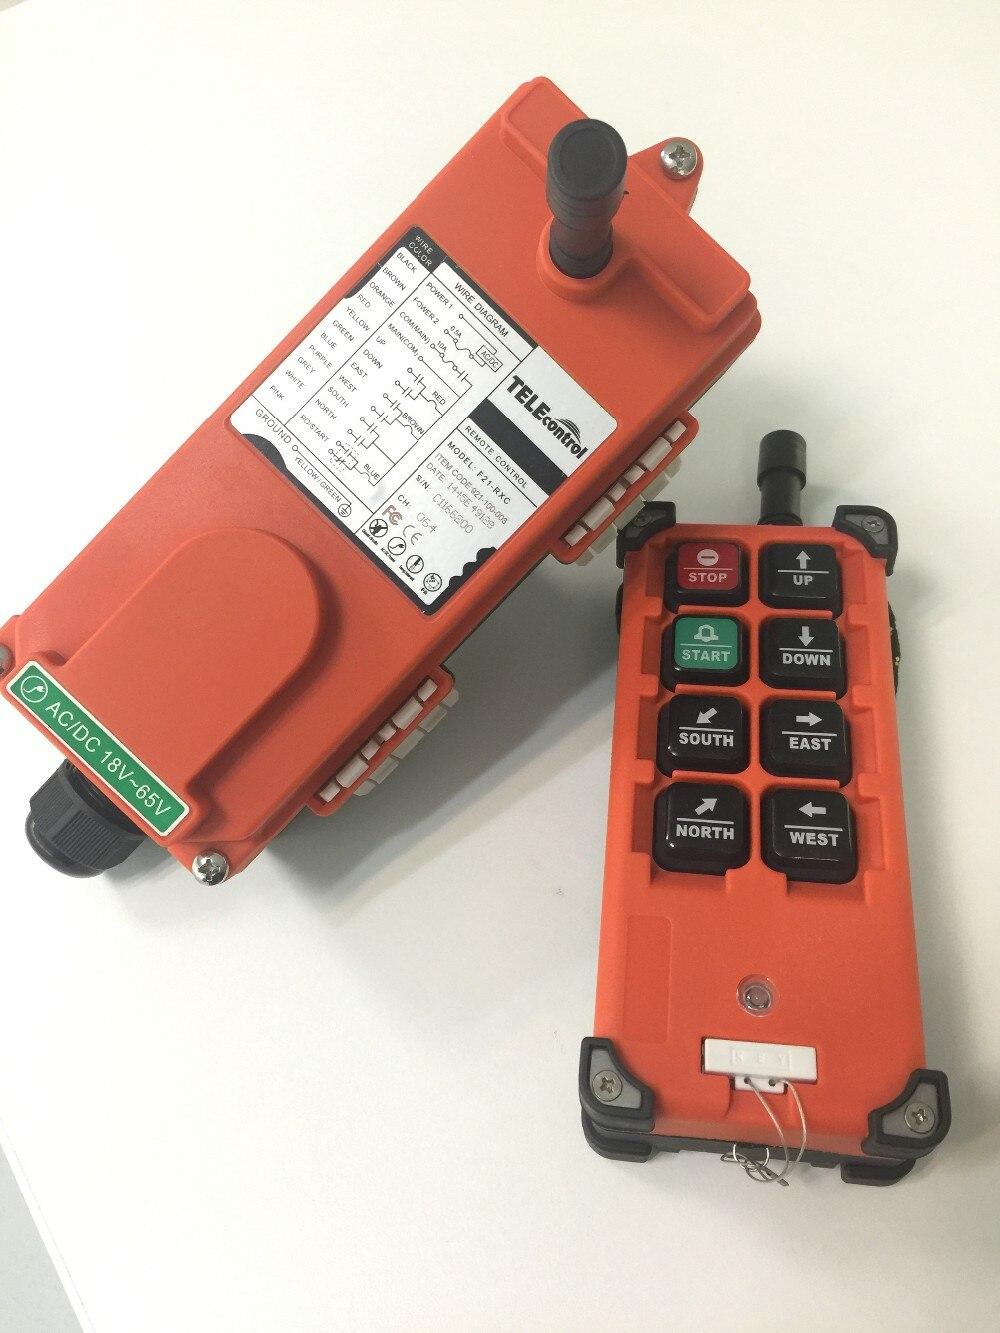 TELEcontrol F21-E1B 1 transmitter 1 receiver 1 Speed Control Hoist Crane Remote Control